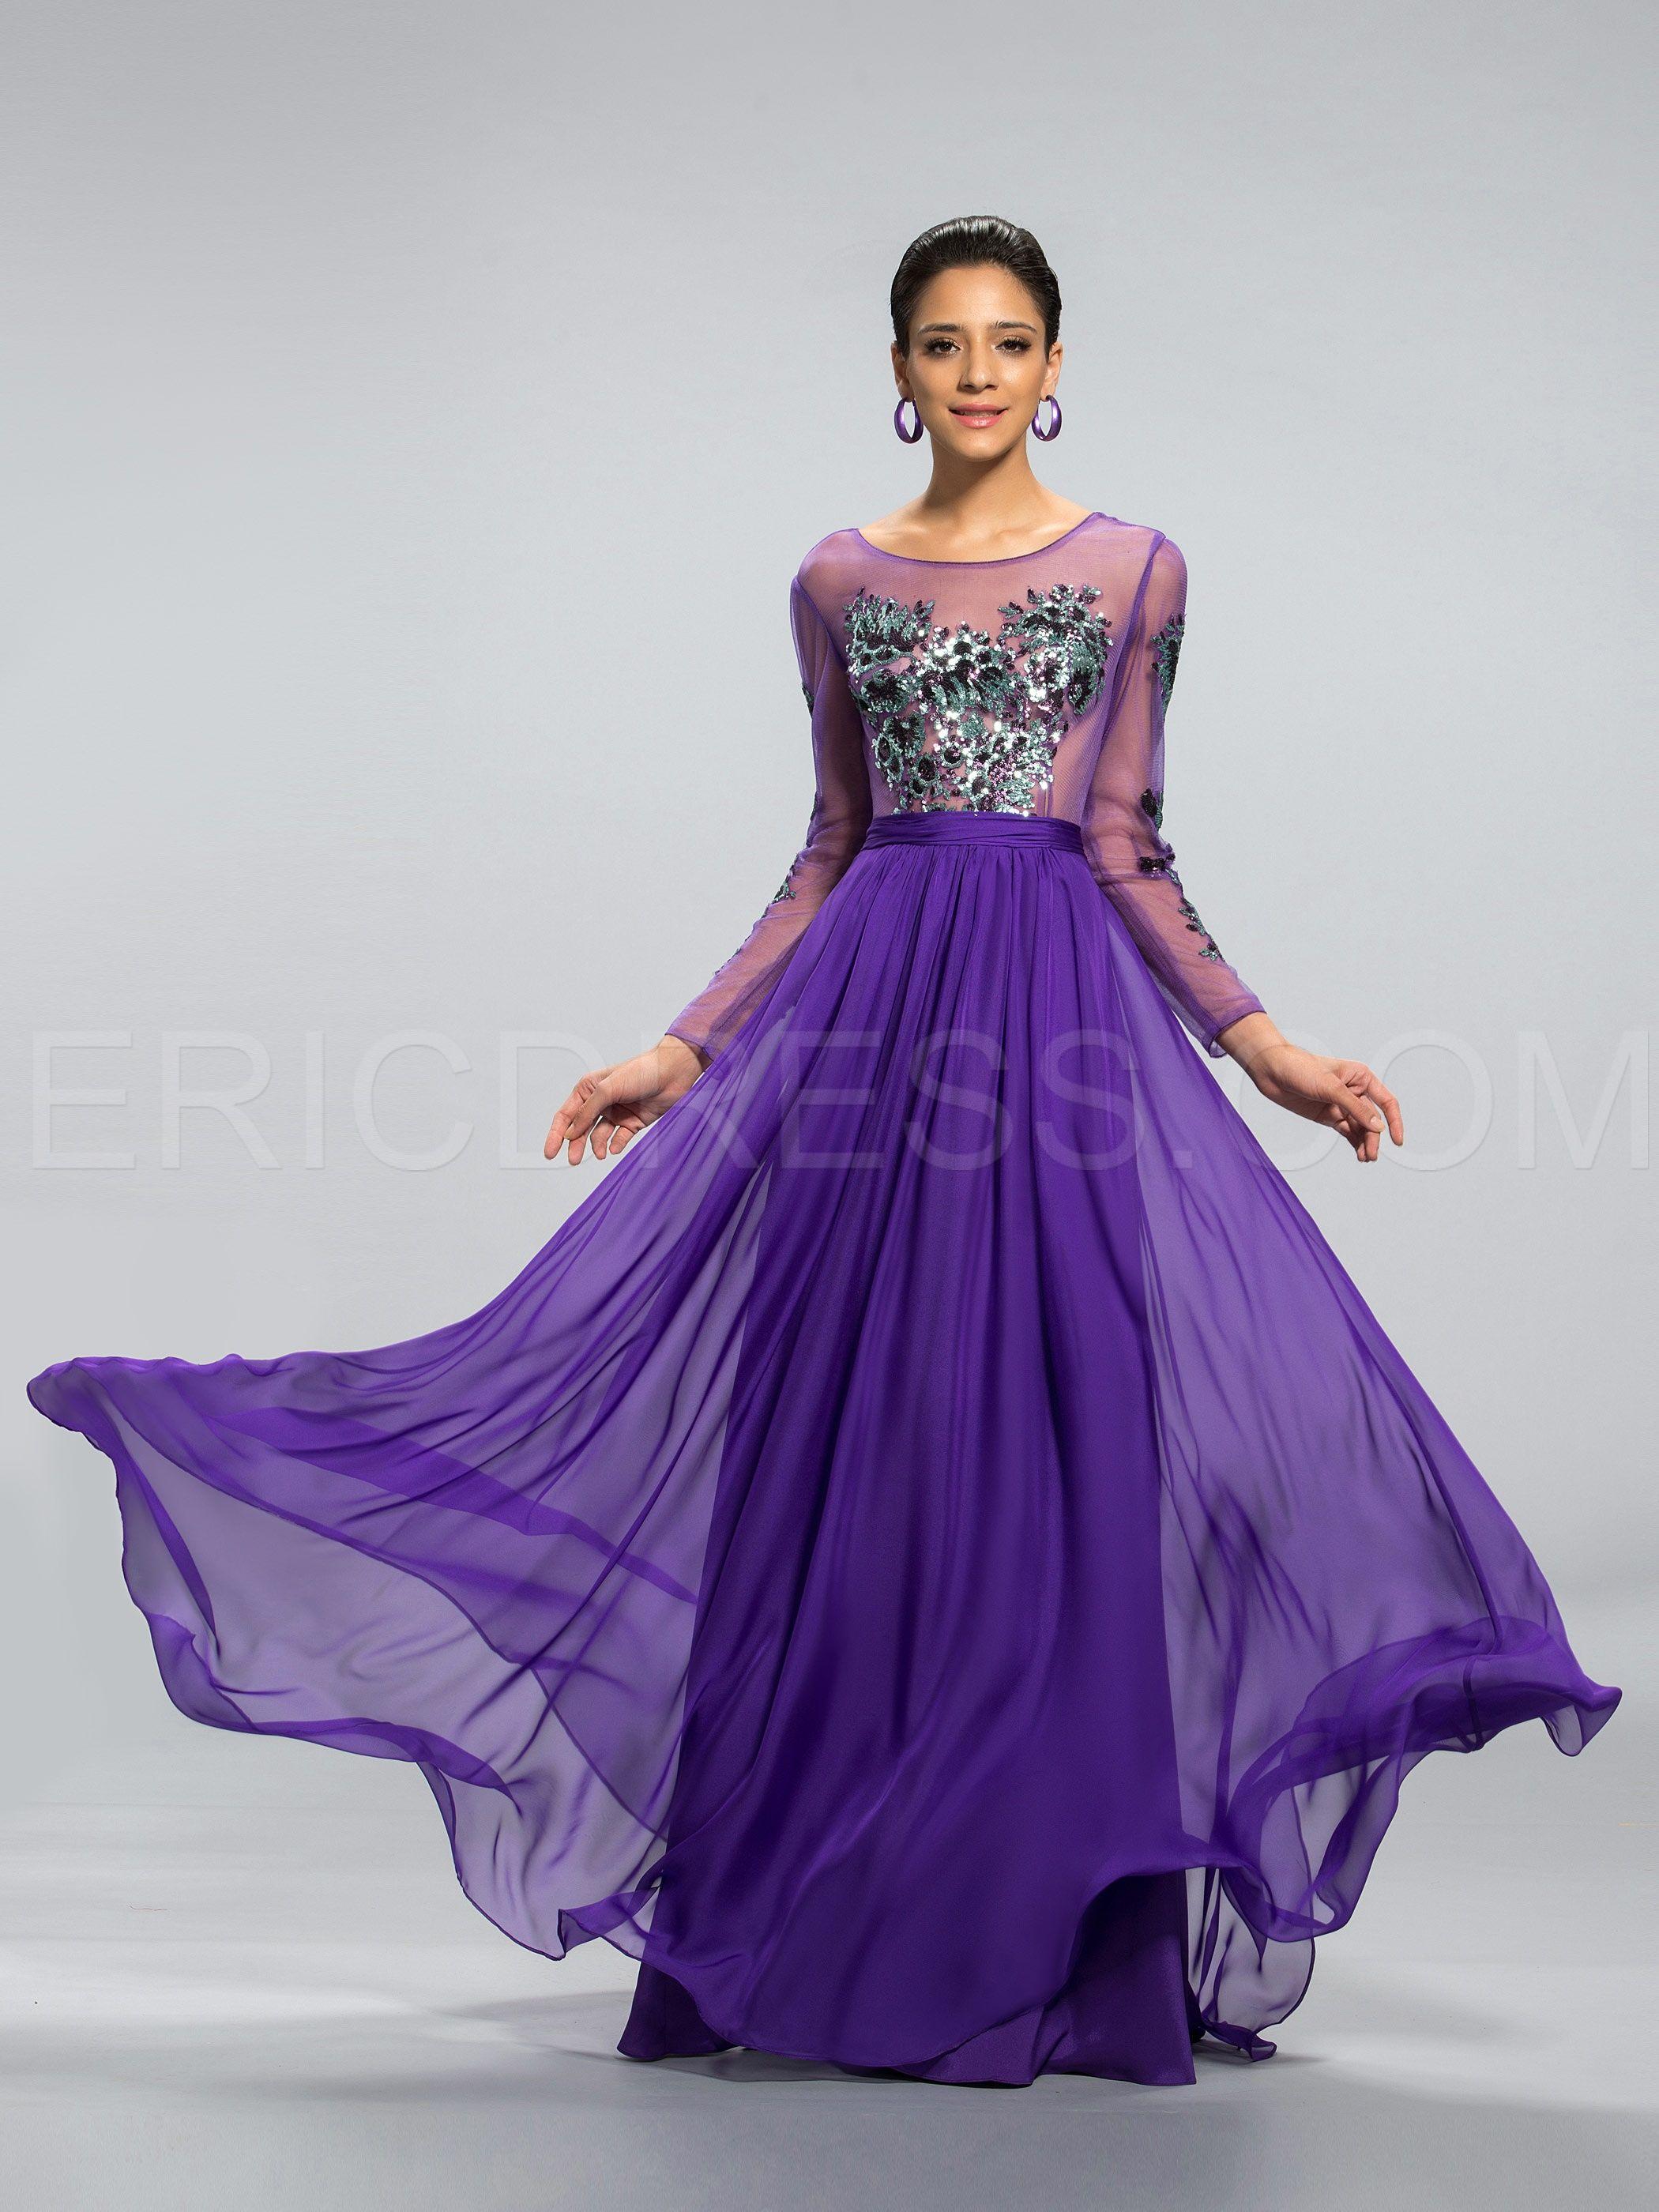 vestido morado   vestidos elegantes   Pinterest   Vestido morado ...